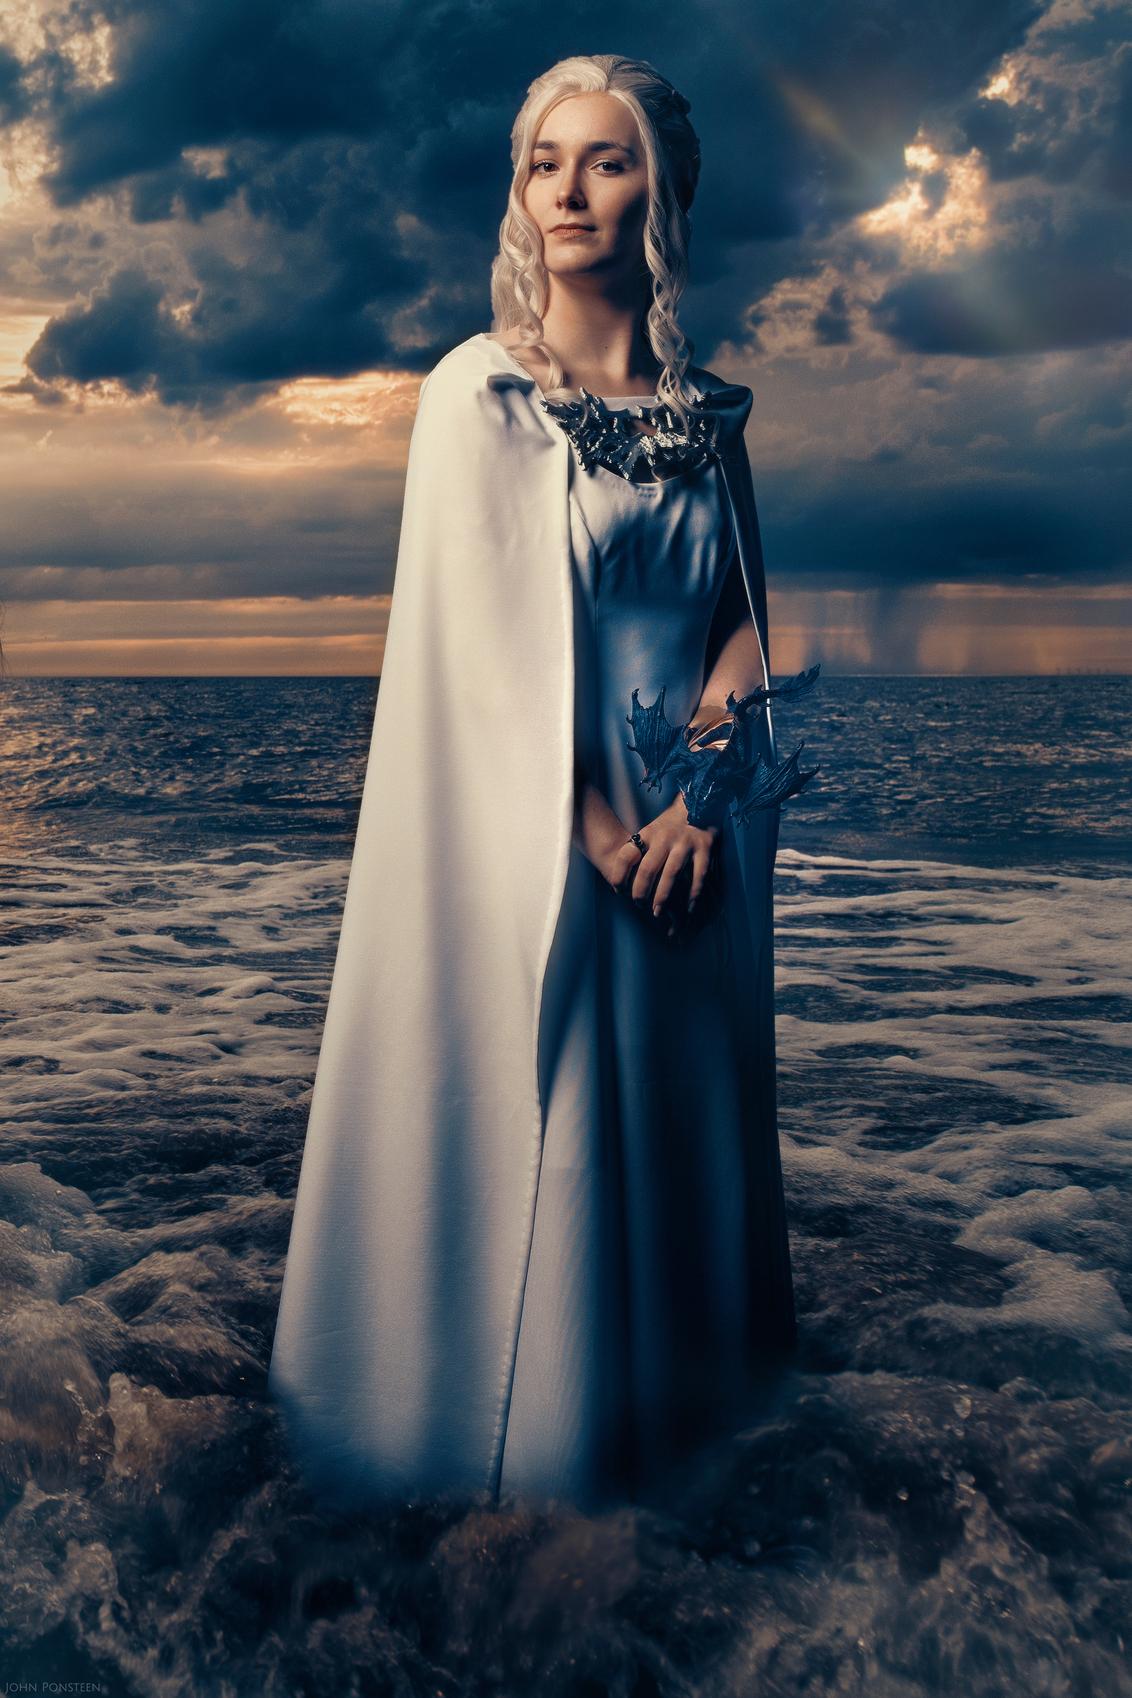 Daenerys Targaryen - - - foto door Etsie op 02-03-2020 - deze foto bevat: vrouw, wolken, zee, regen, portret, model, storm, flits, ogen, haar, beauty, photoshop, wisselvallig, outfit, strobist, cosplay, fine art